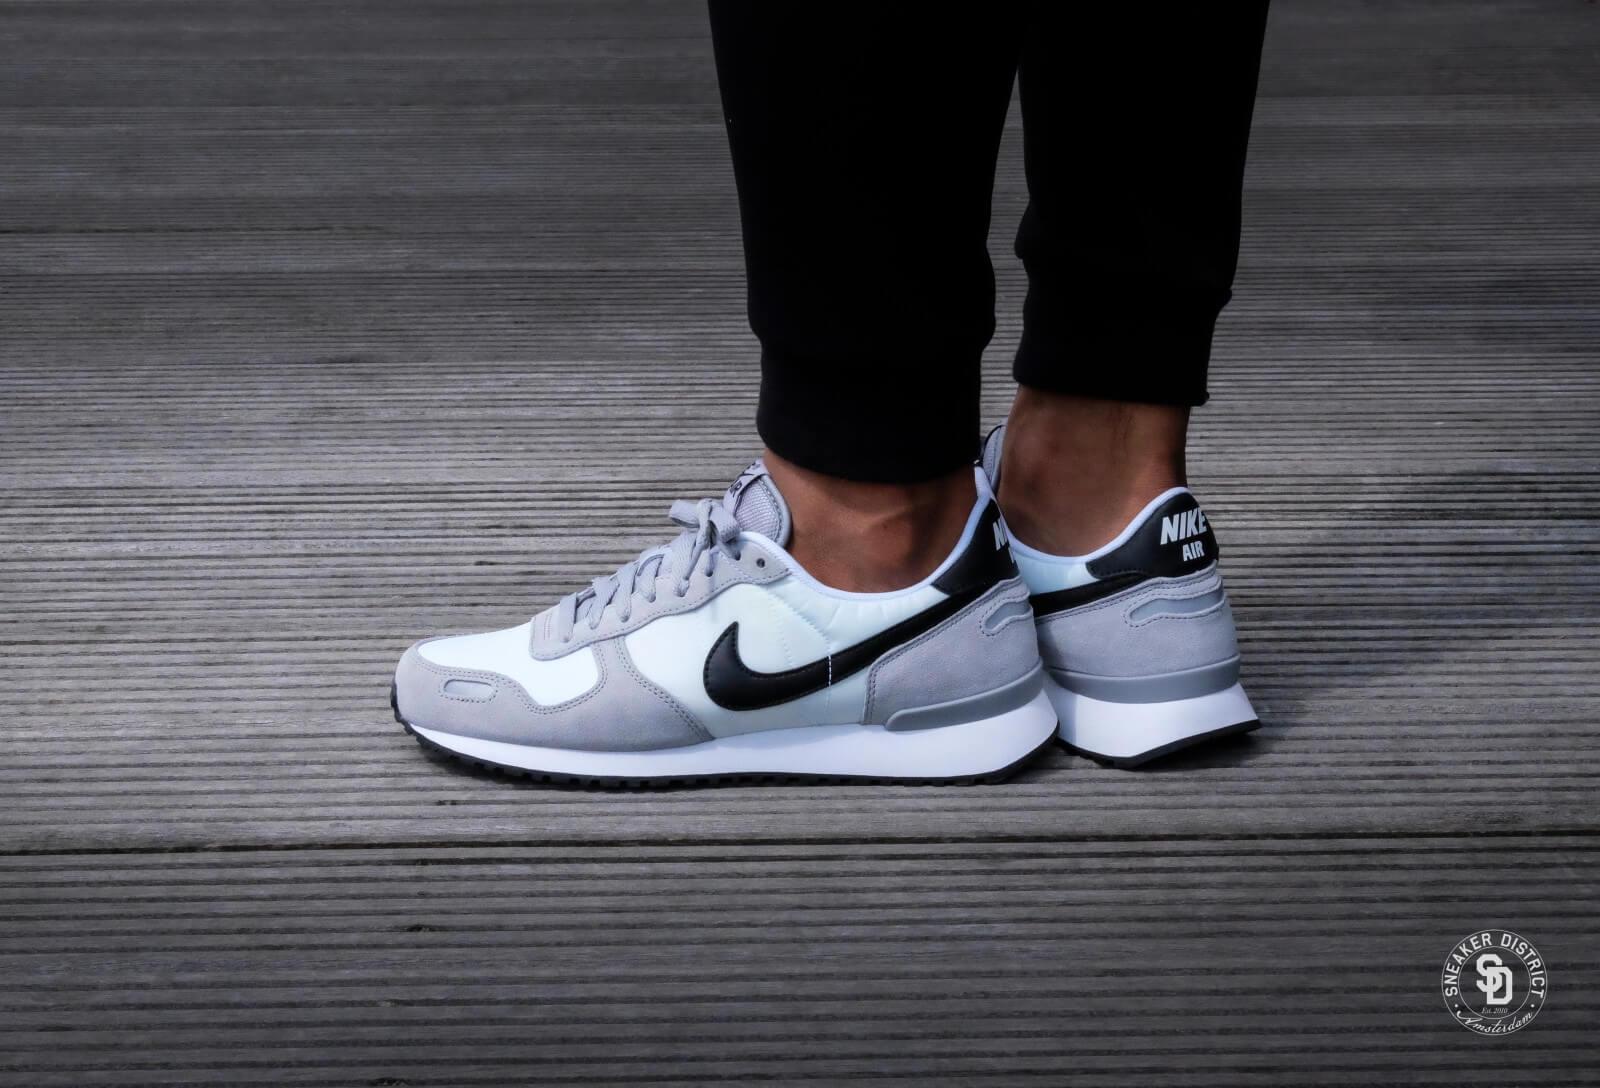 Nike Air Vortex Wolf GreyBlack White Black 903896 003